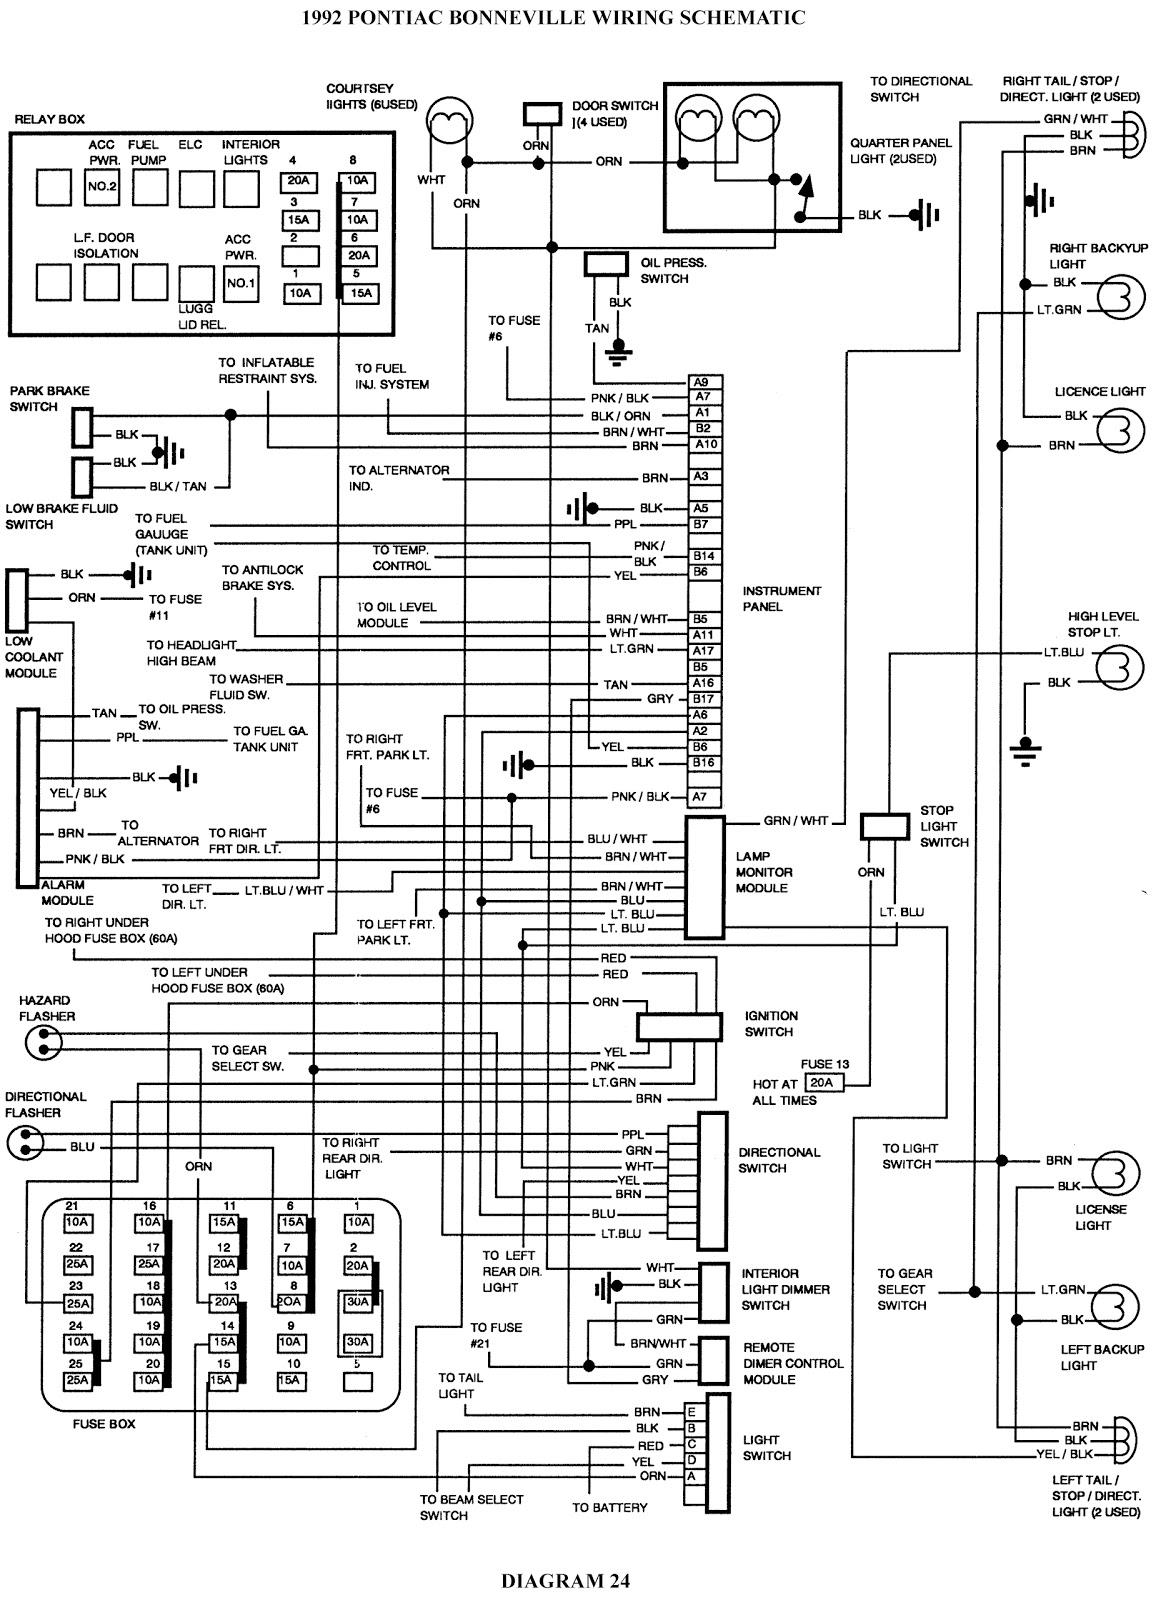 medium resolution of 2002 pontiac bonneville wiring diagrams detailed wiring diagram rh 7 6 ocotillo paysage com 2002 pontiac sunfire wiring diagram 2002 pontiac sunfire wiring